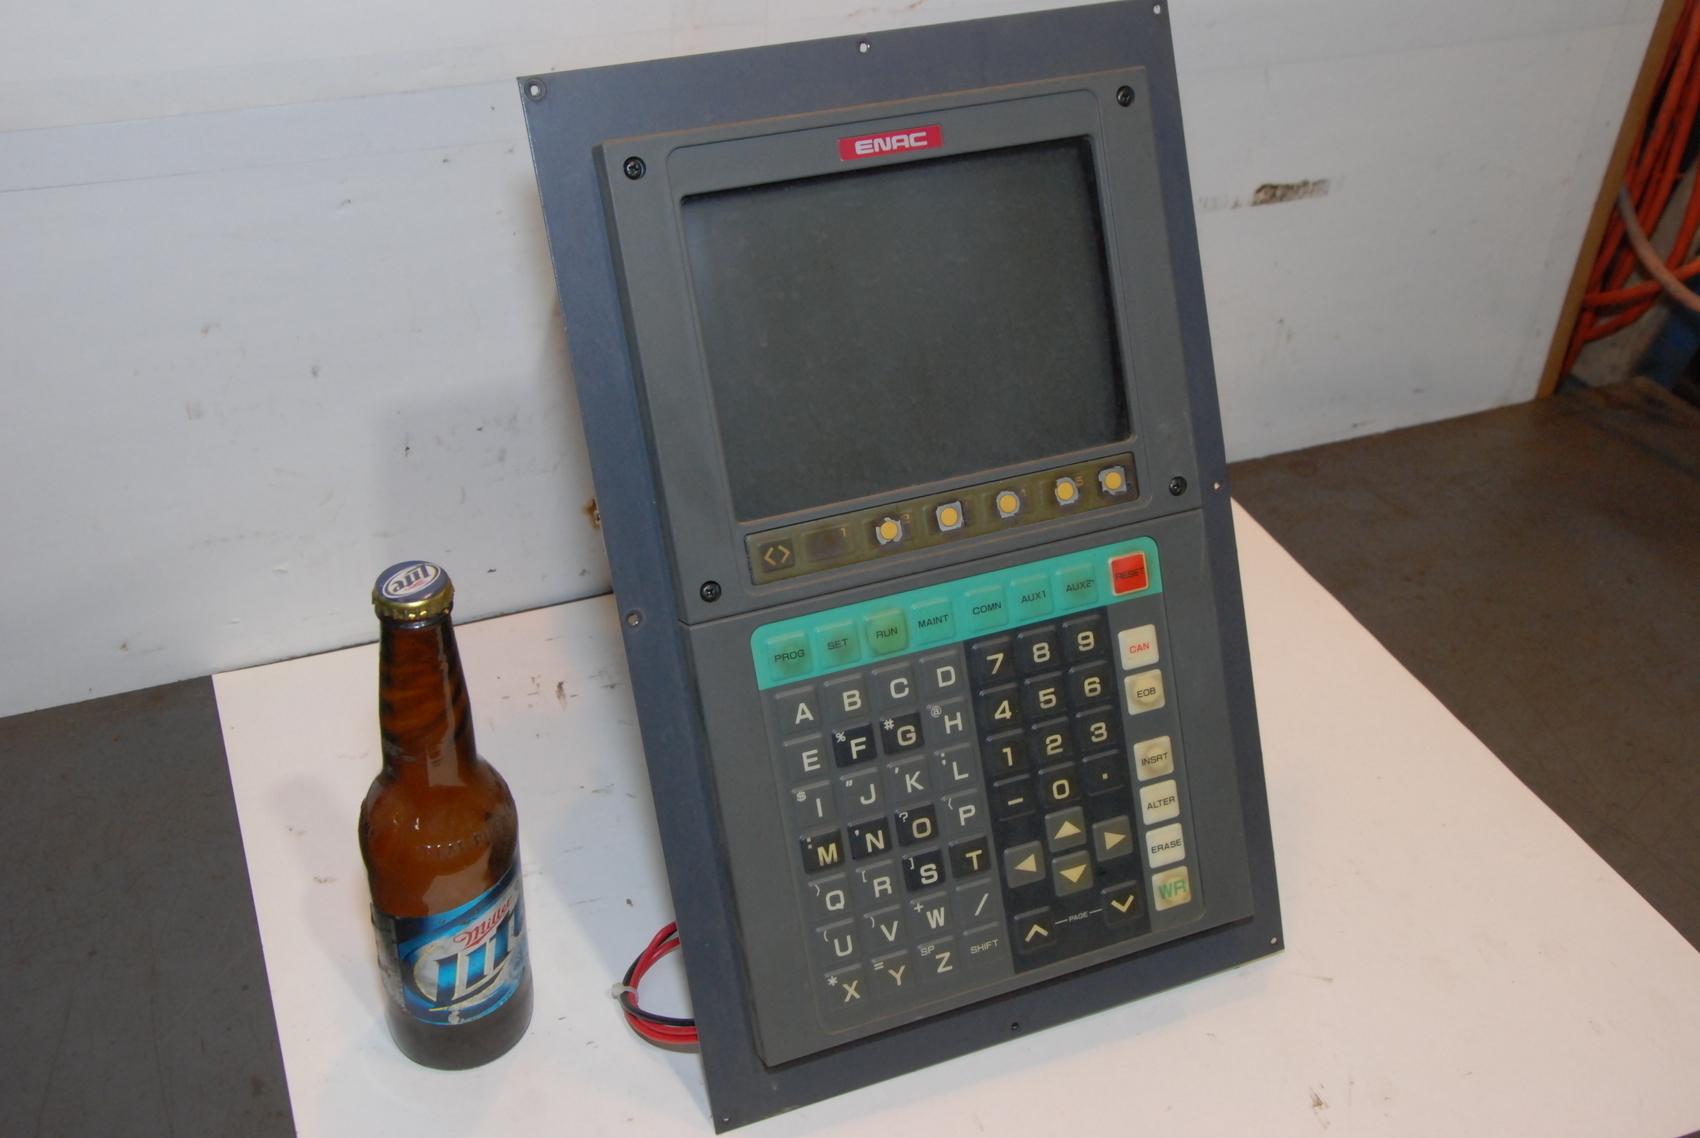 ENAC JZNC-IOP32E1 TOSHIBA CONTROL MONITOR